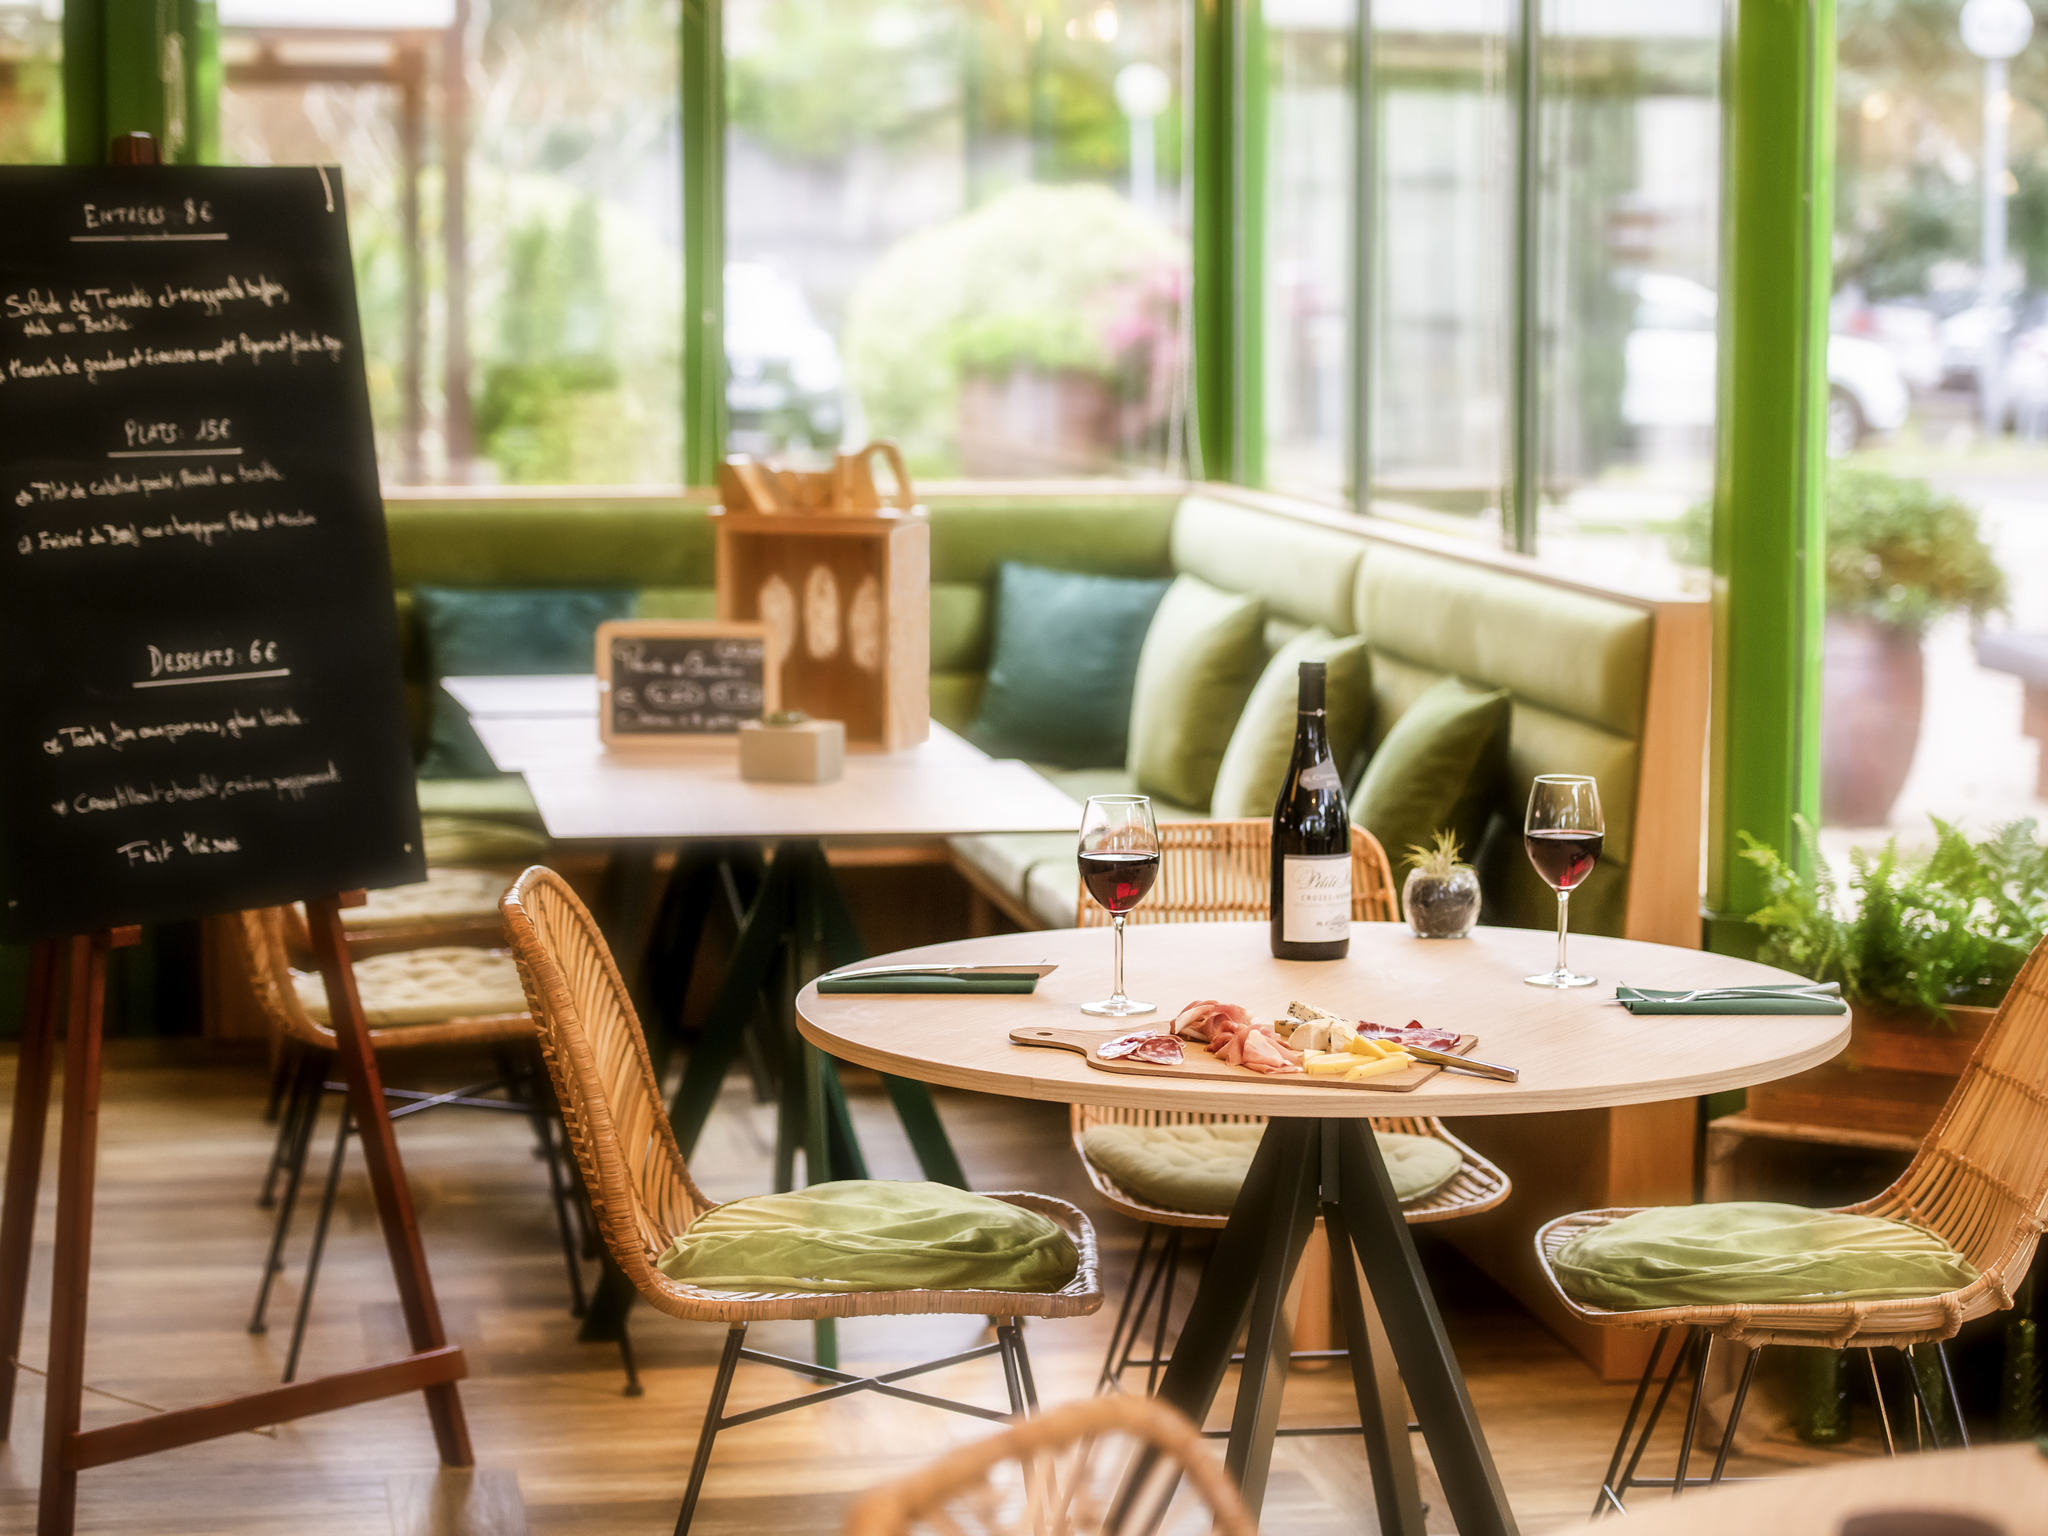 Restaurant Le Plaisir Des Sens Niort hotel in niort - mercure niort marais poitevin hotel